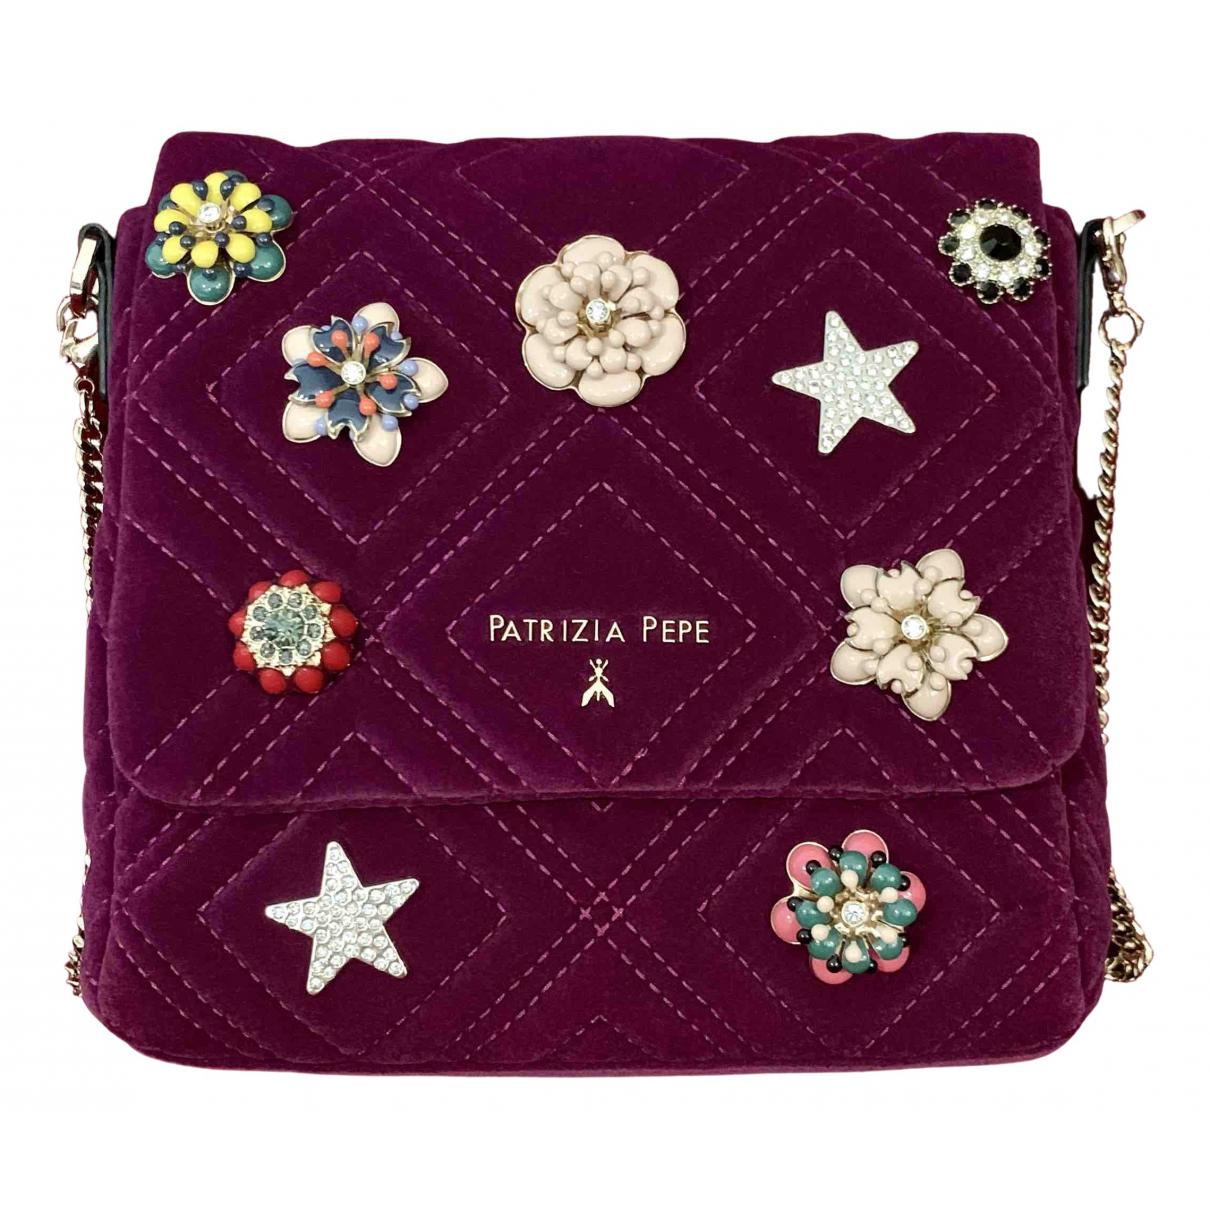 Patrizia Pepe \N Handtasche in  Lila Samt